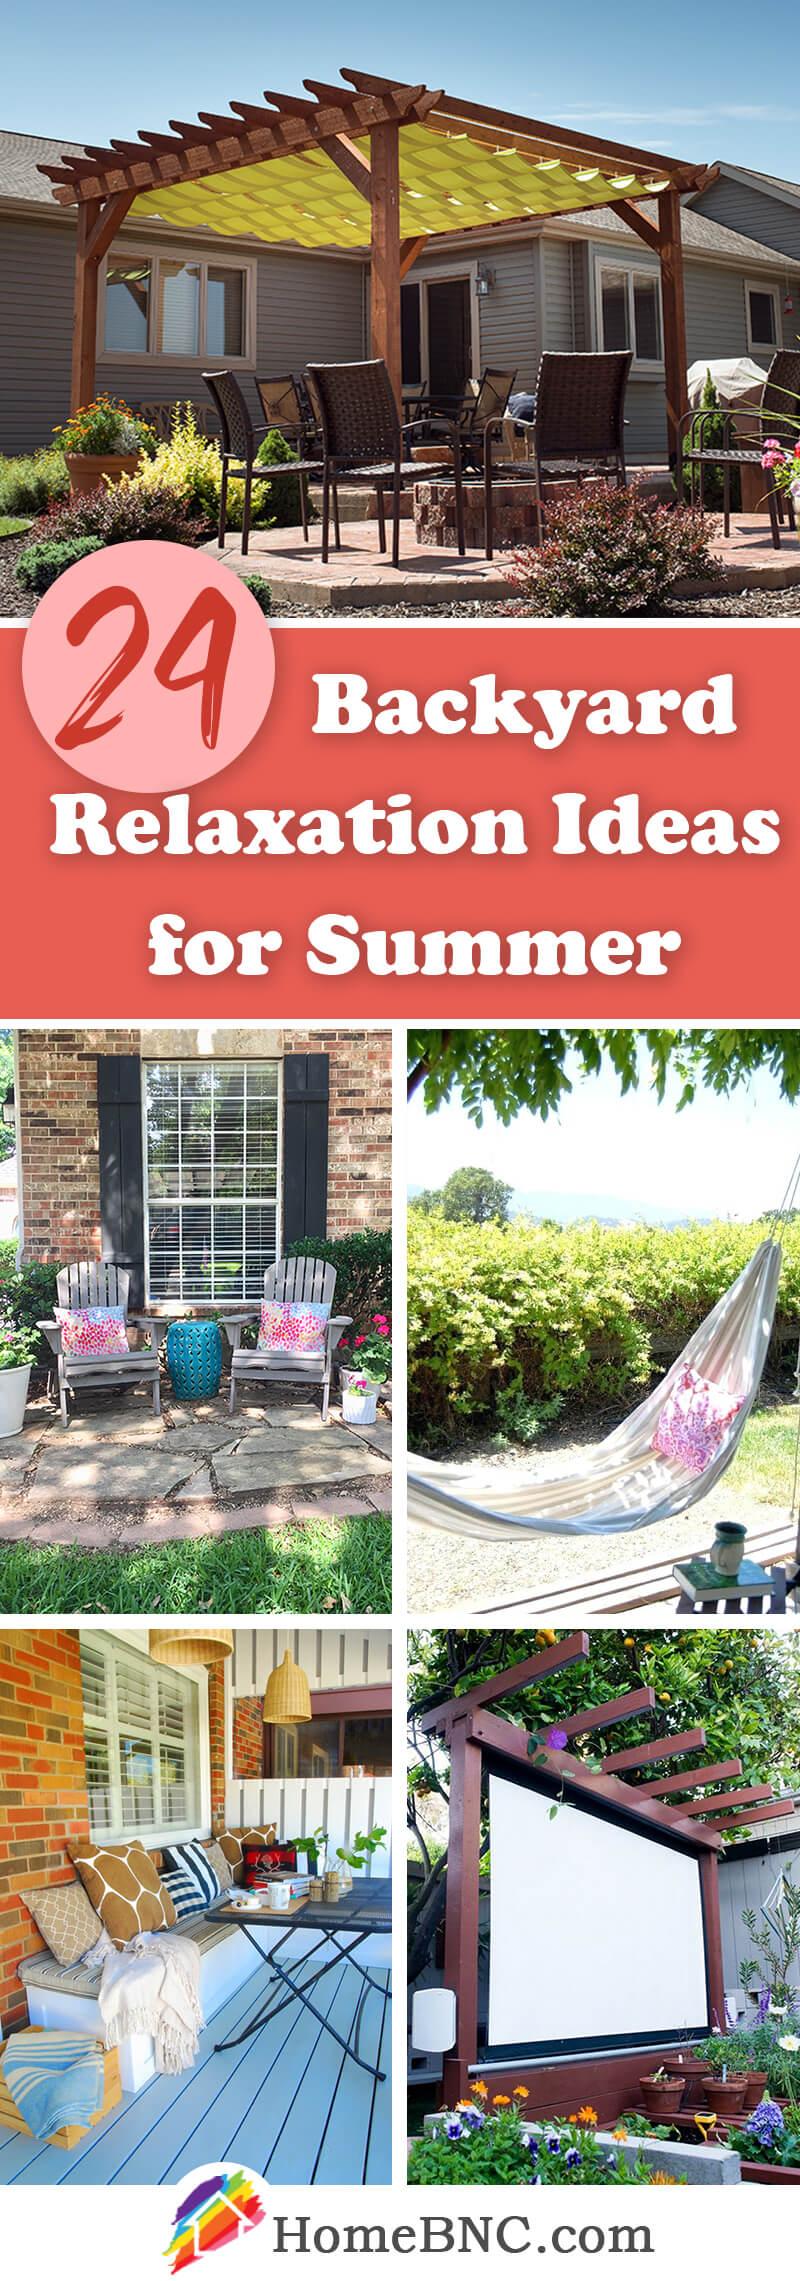 Backyard Relaxation Ideas